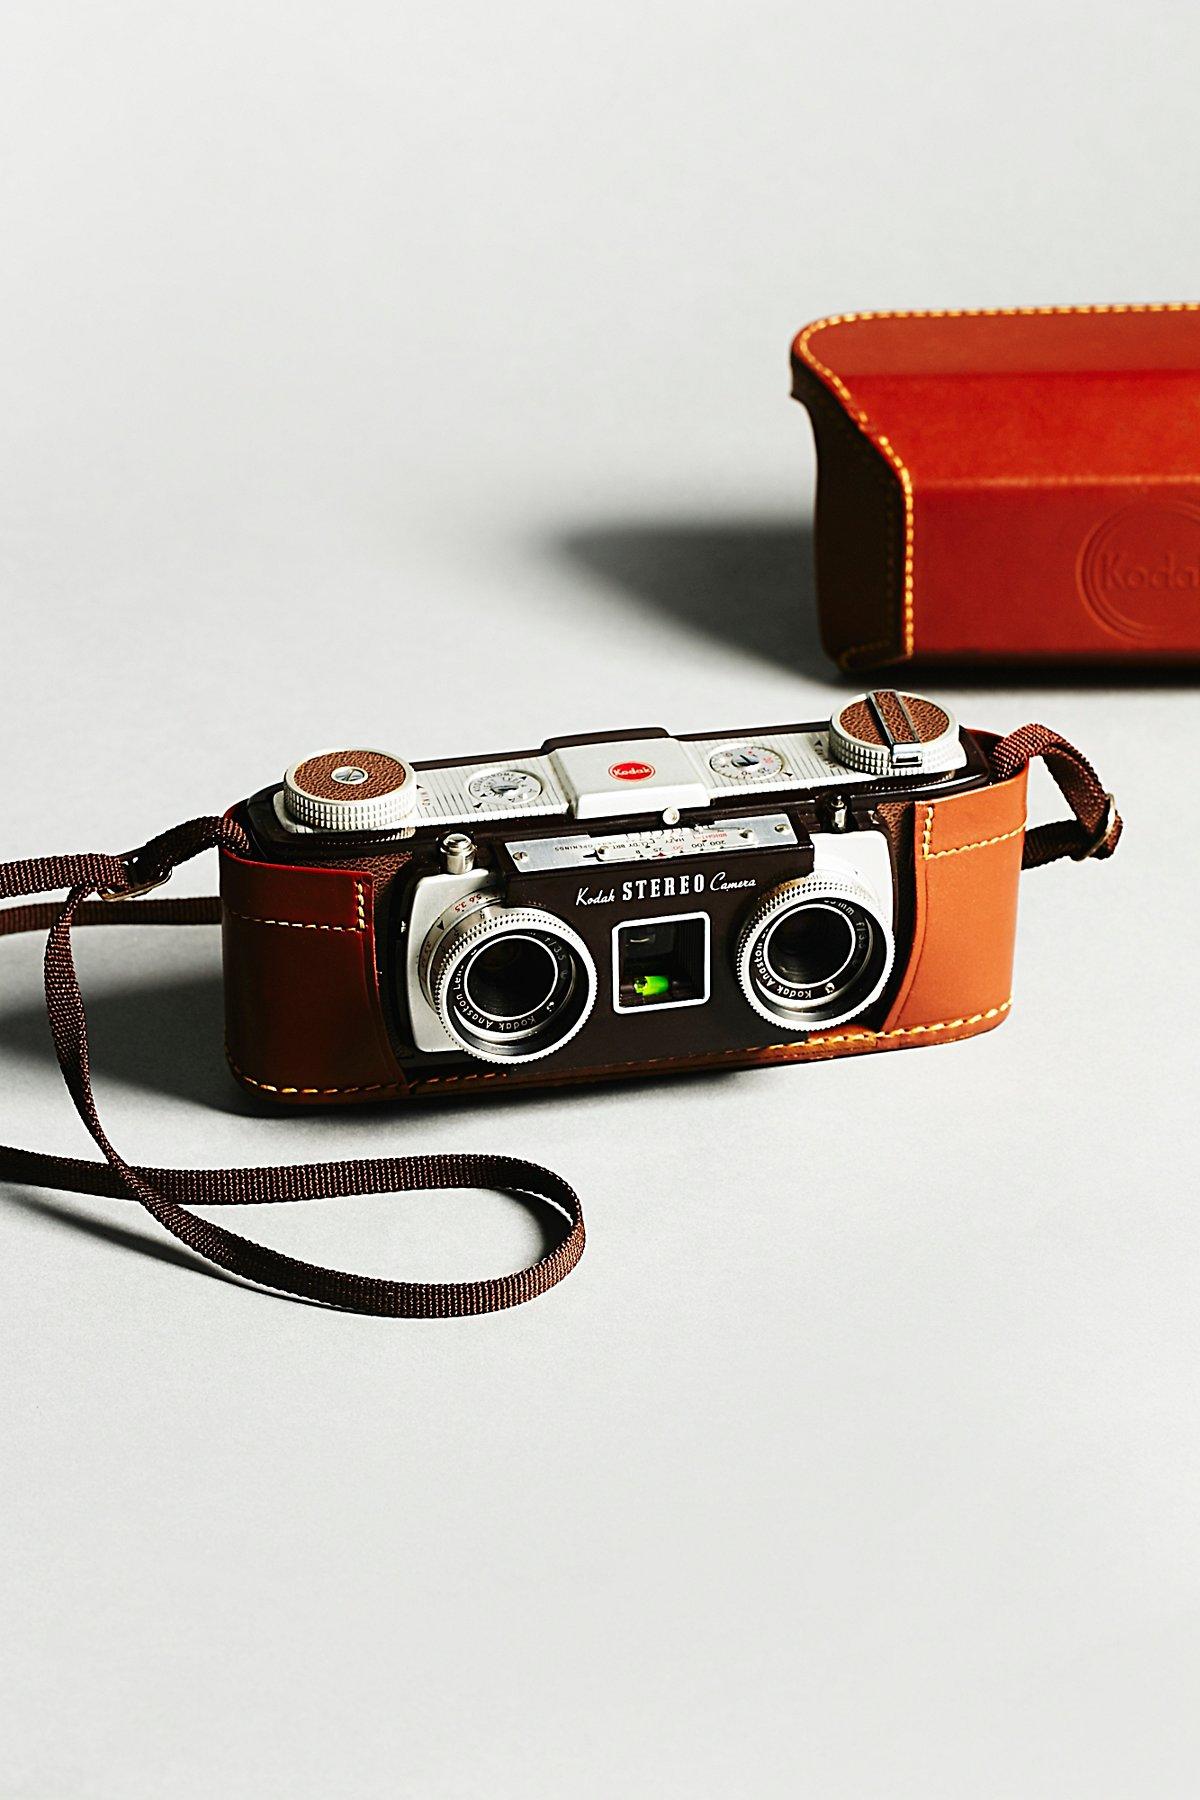 Vintage 1950s Kodak Stereo Camera